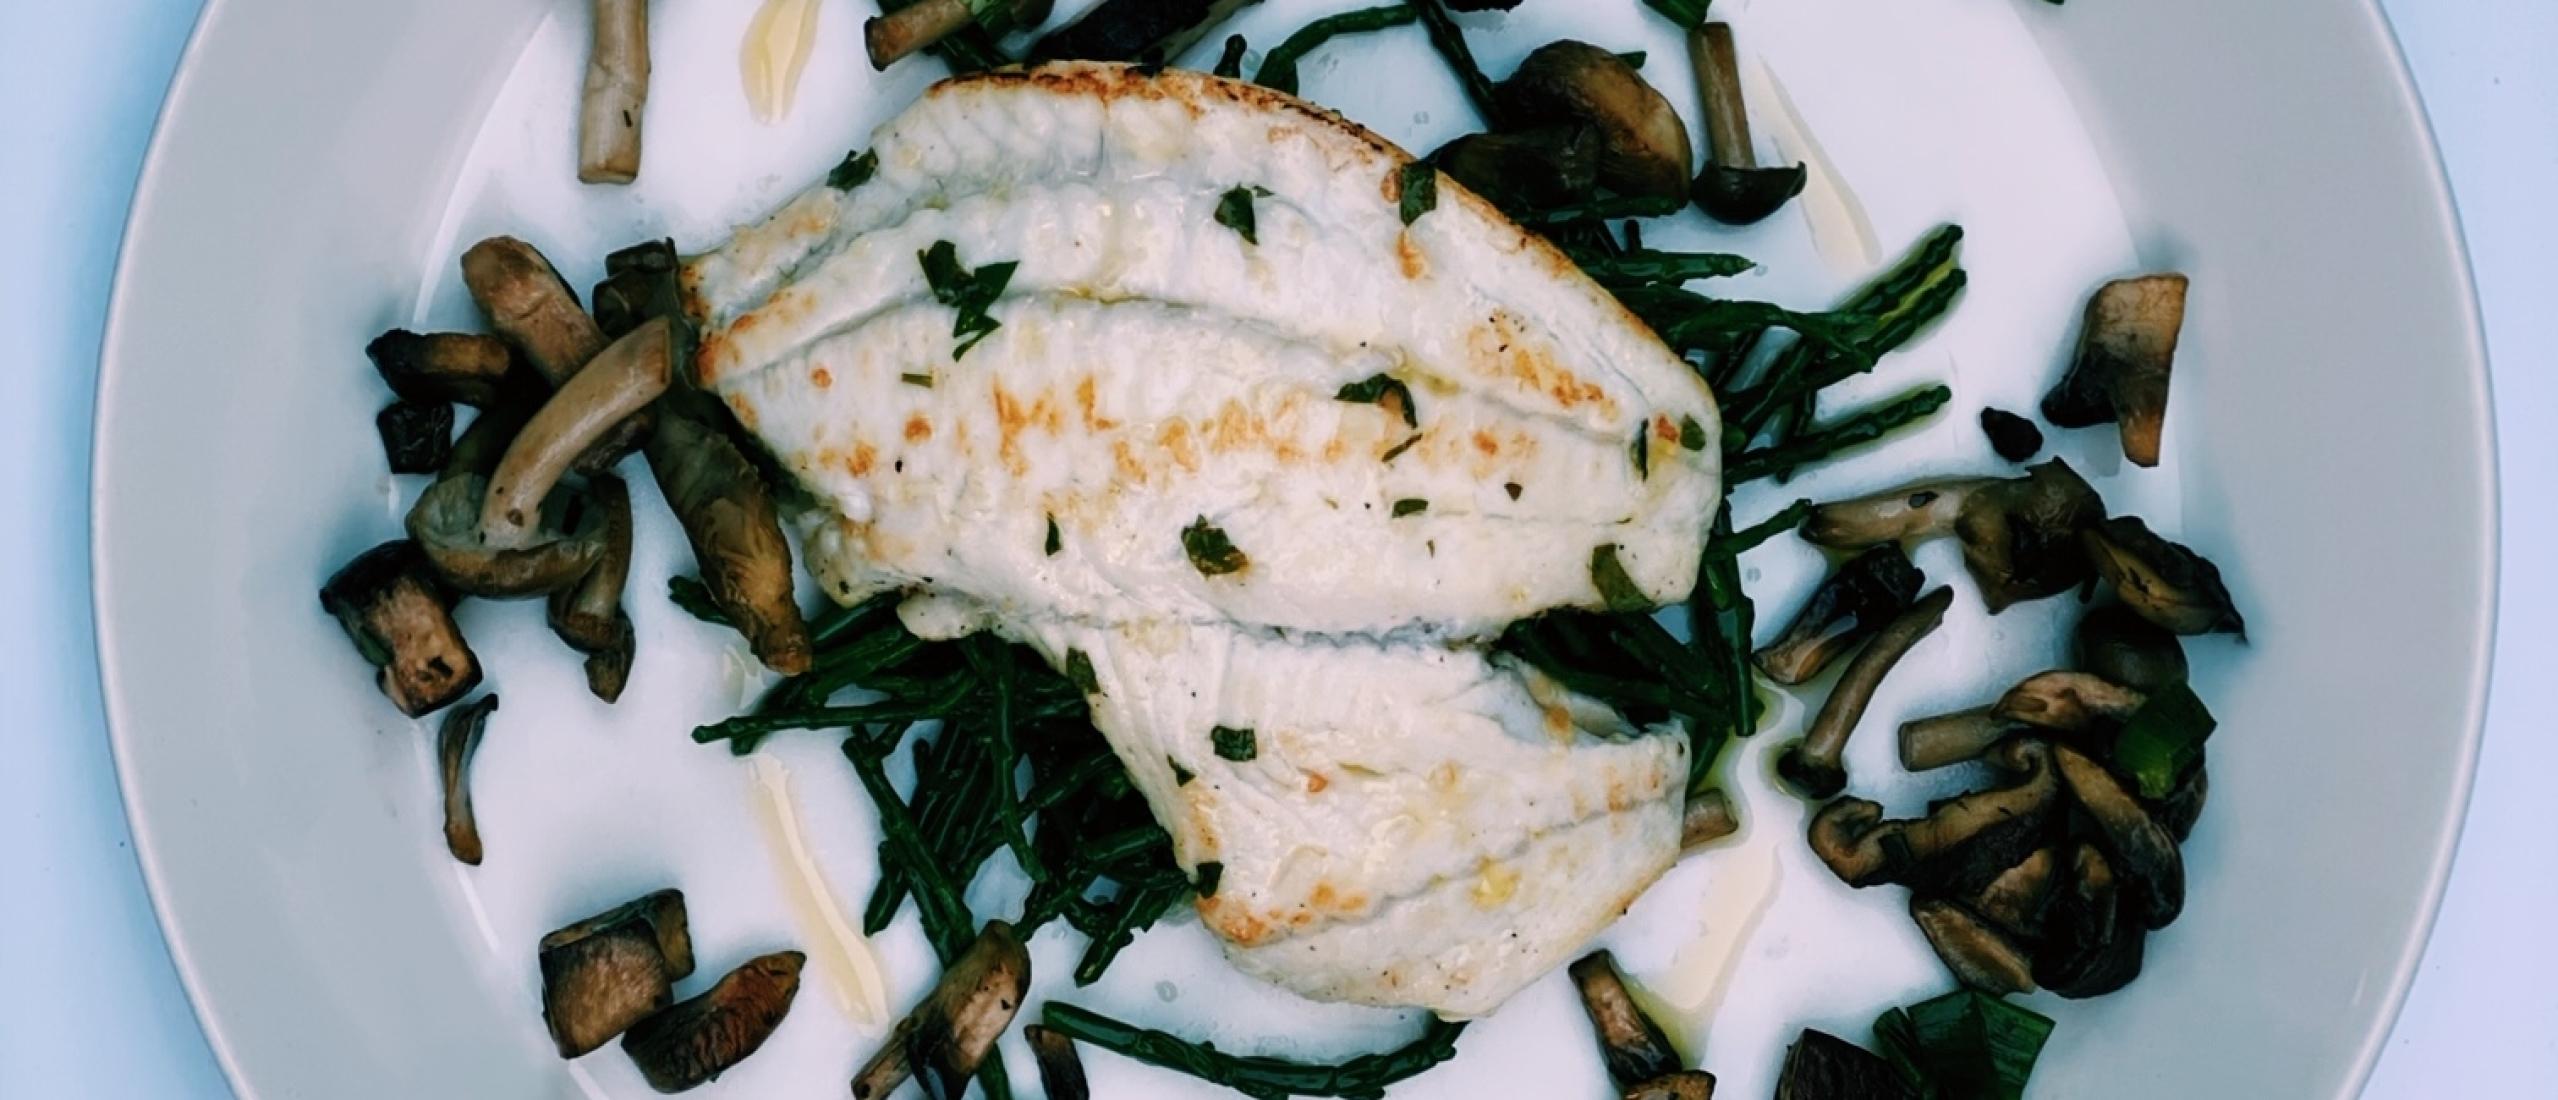 Tarbotfilet met gebakken bospaddenstoelen en zeekraal